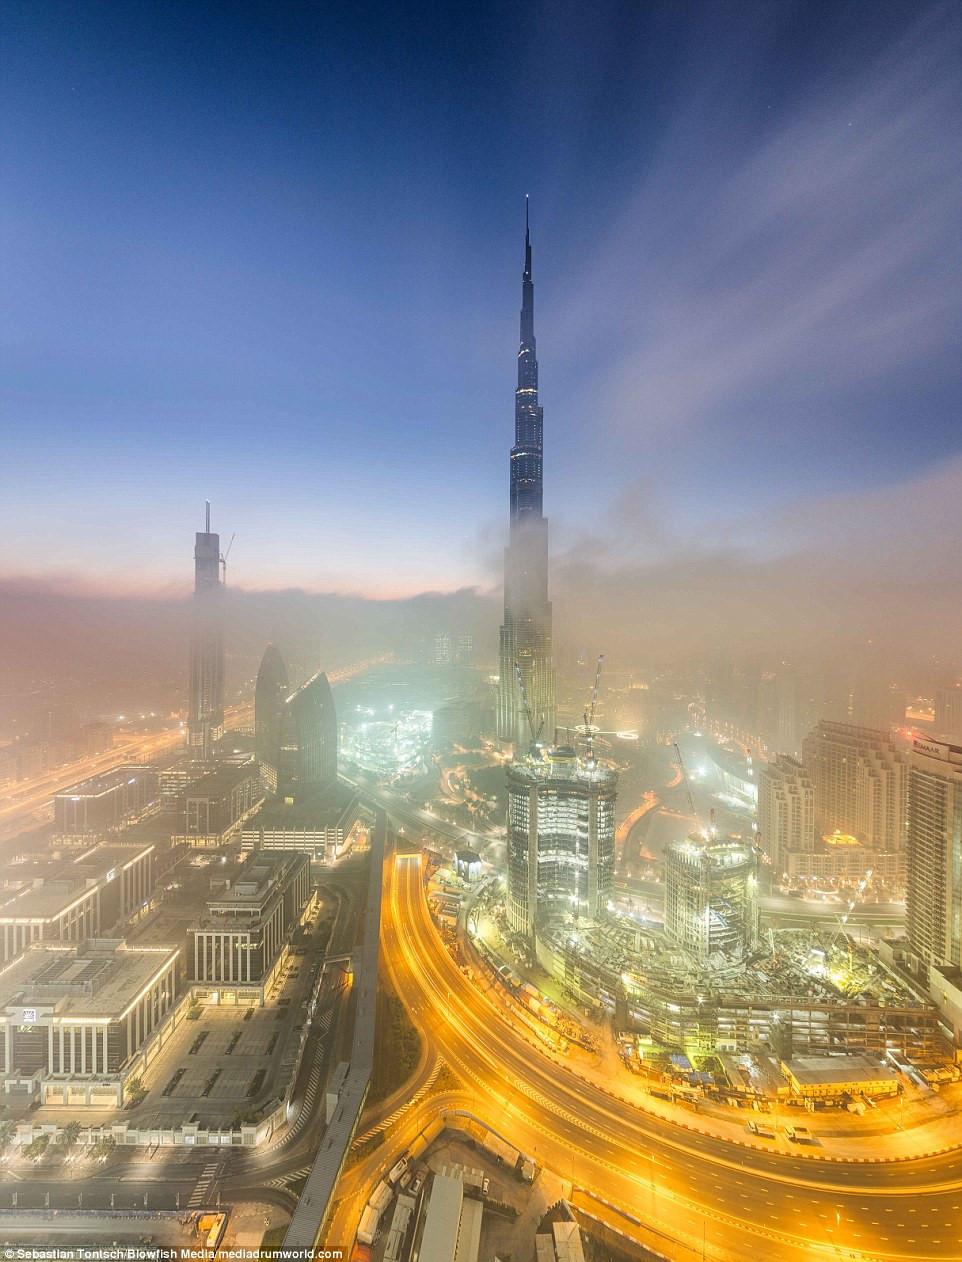 Nhung toa nha choc troi o Dubai huyen ao trong suong hinh anh 5